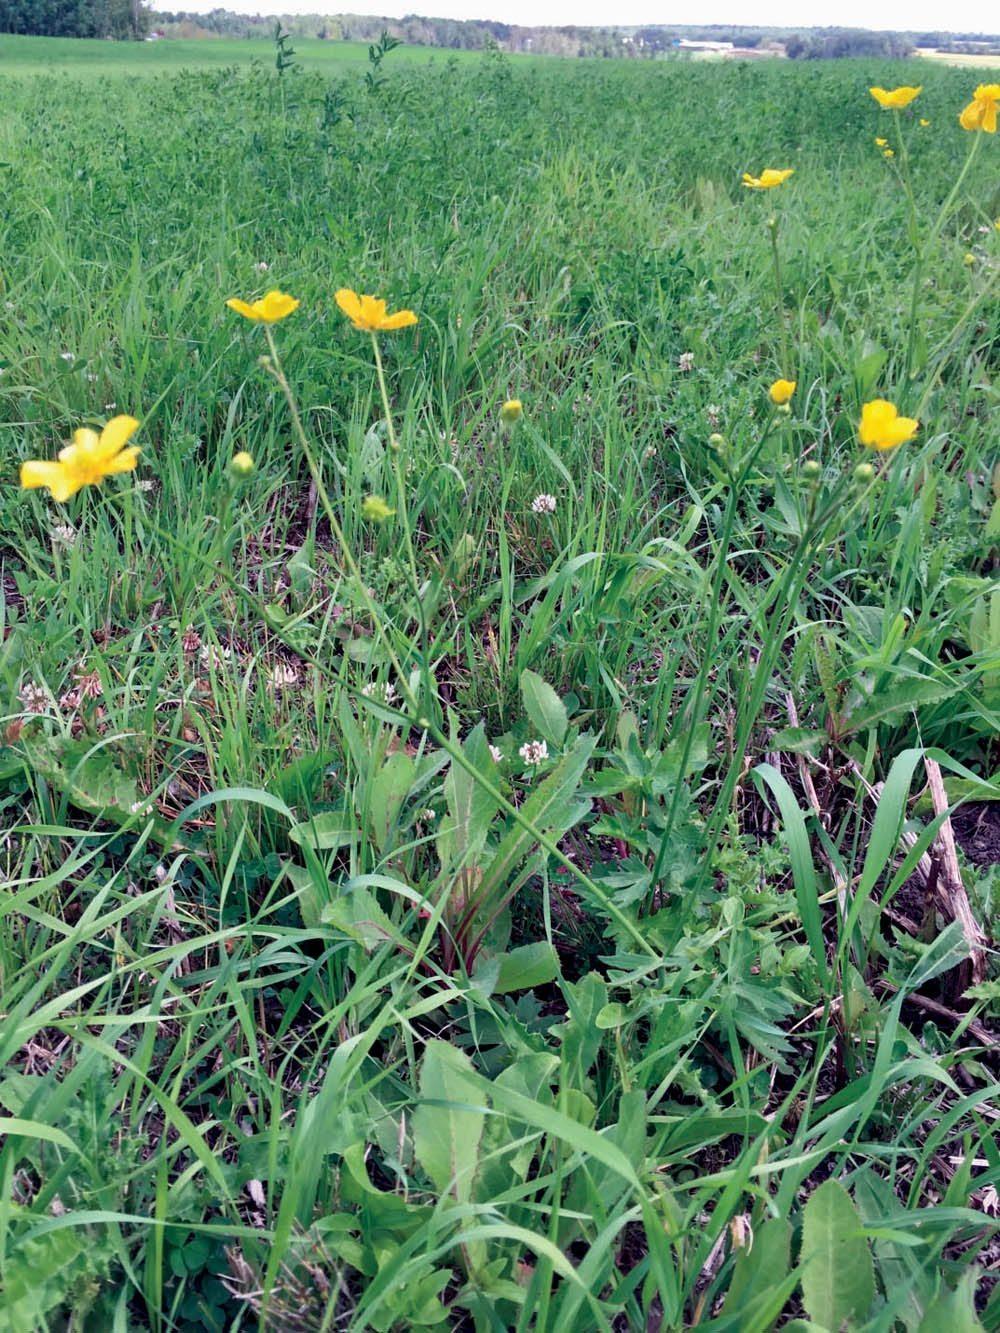 Bitter Weed A Common Sight In Alberta Alberta Farmer Express